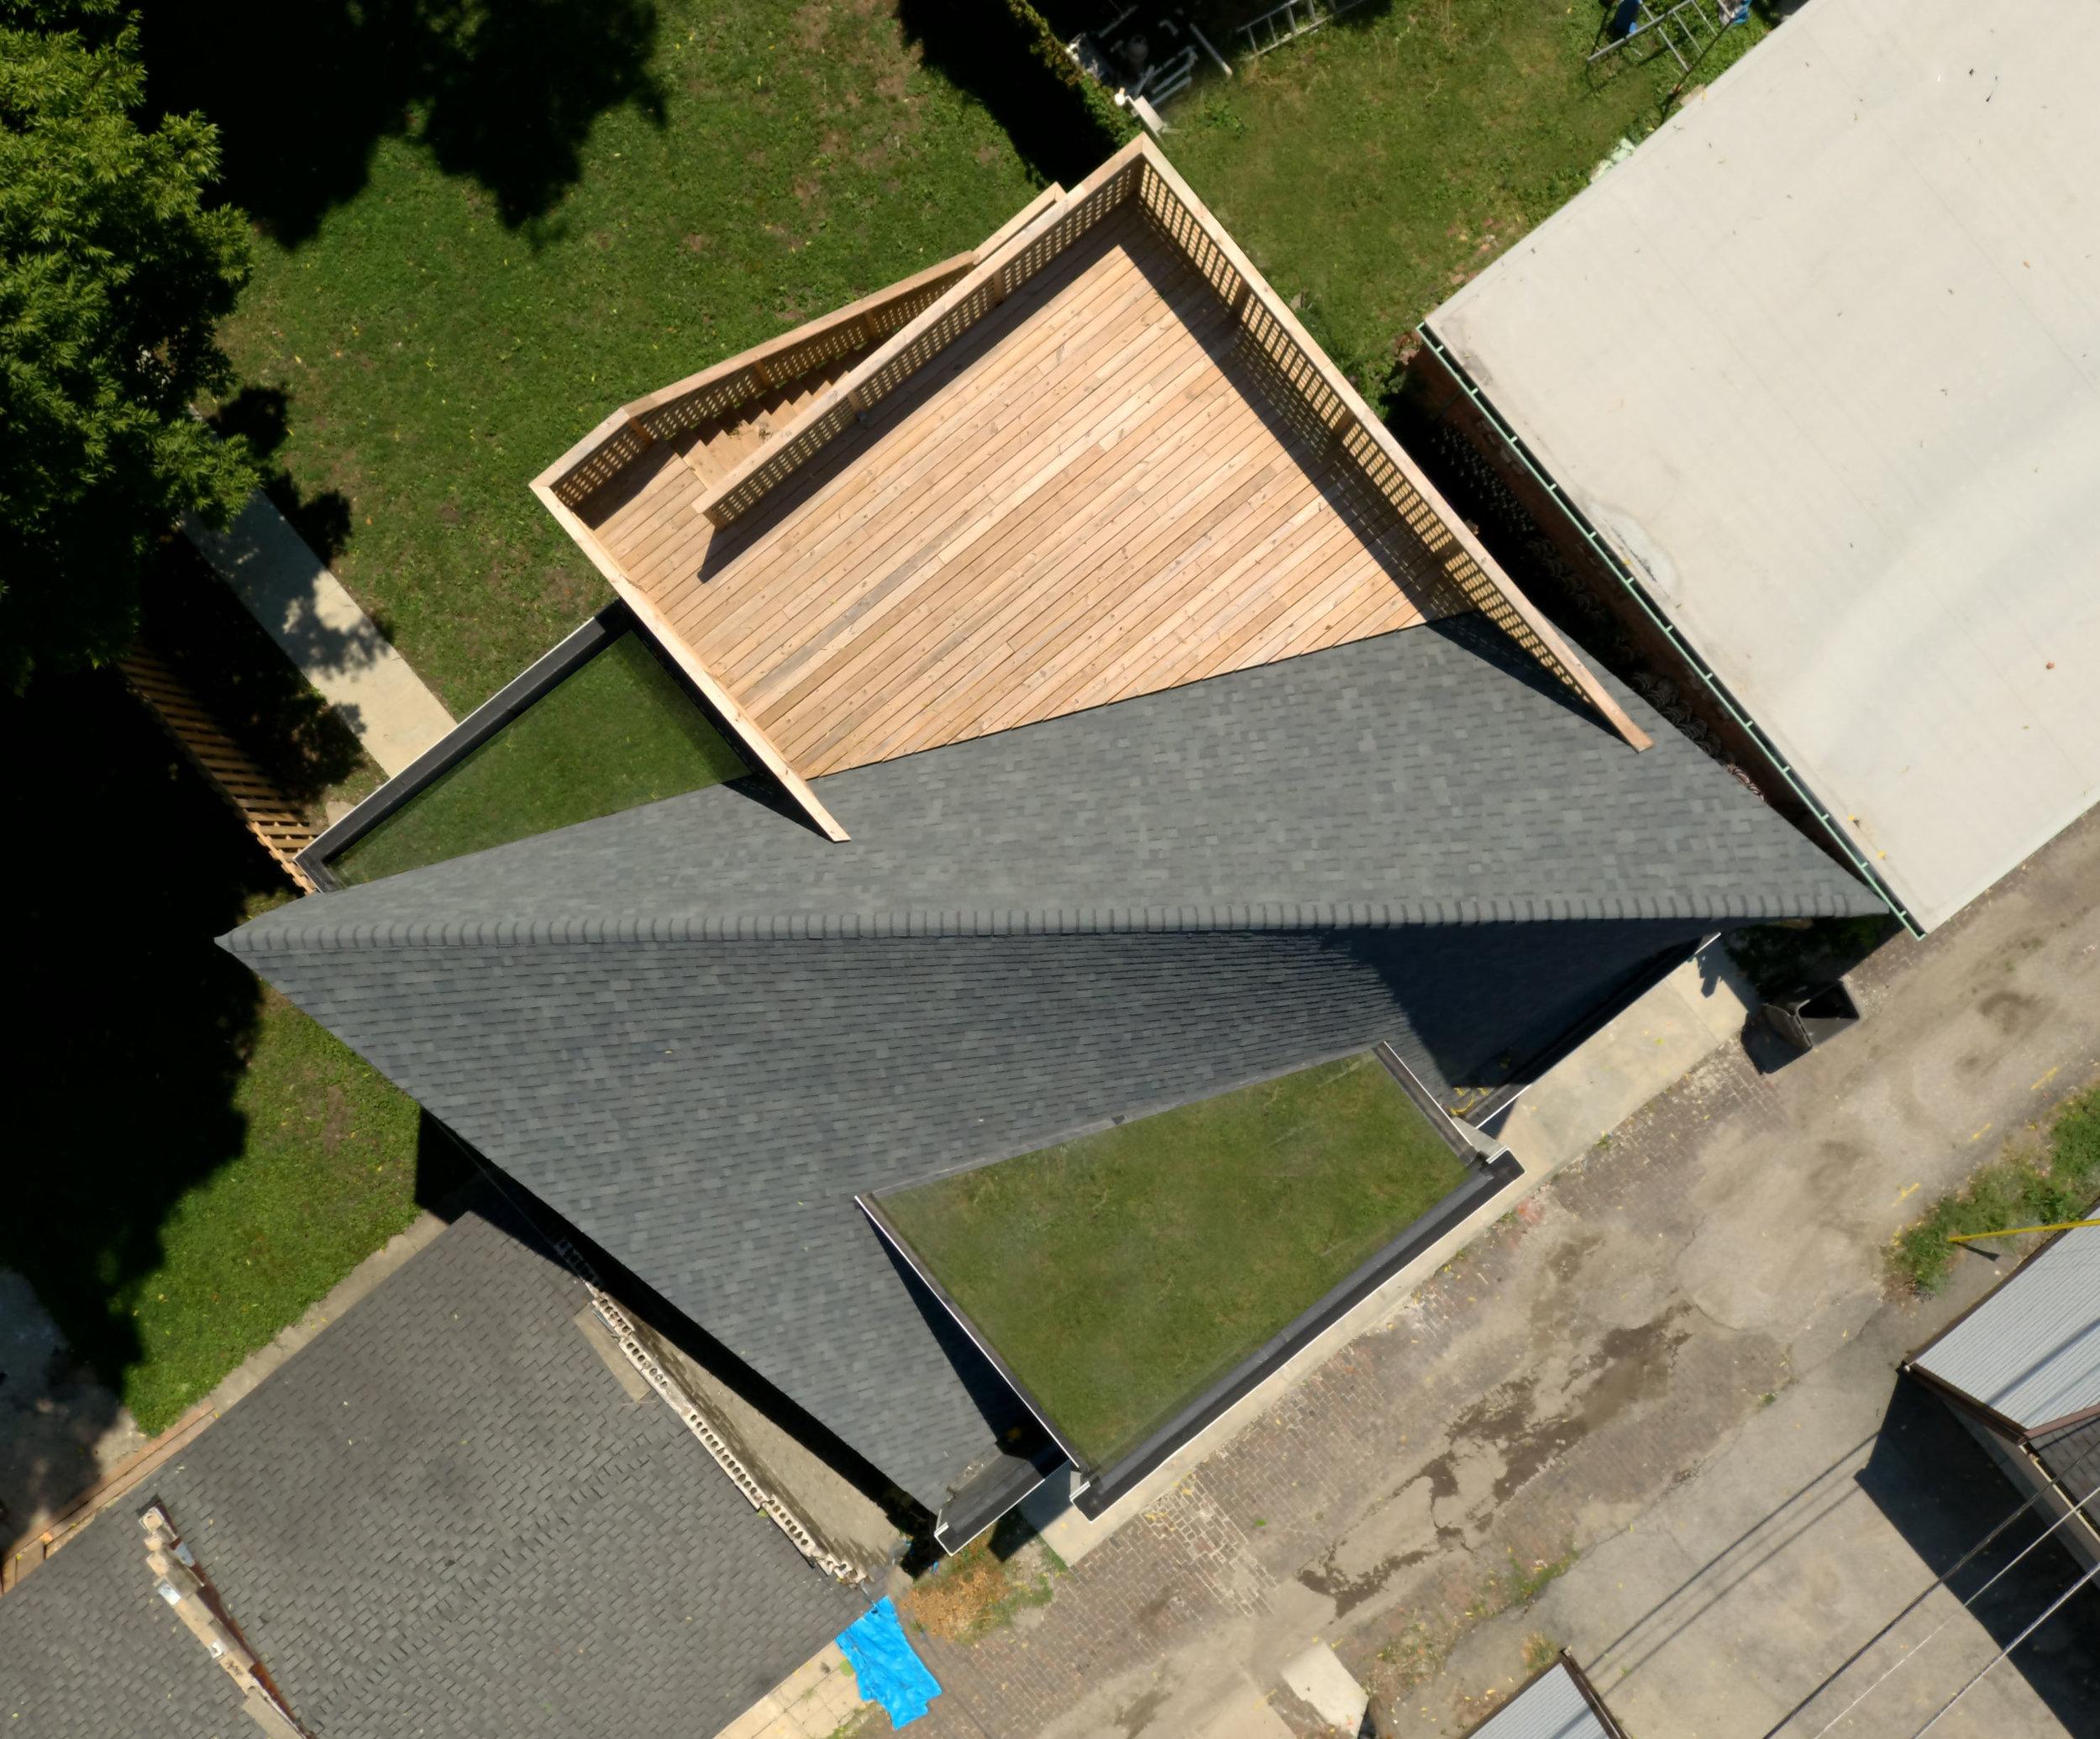 green roof.jpg